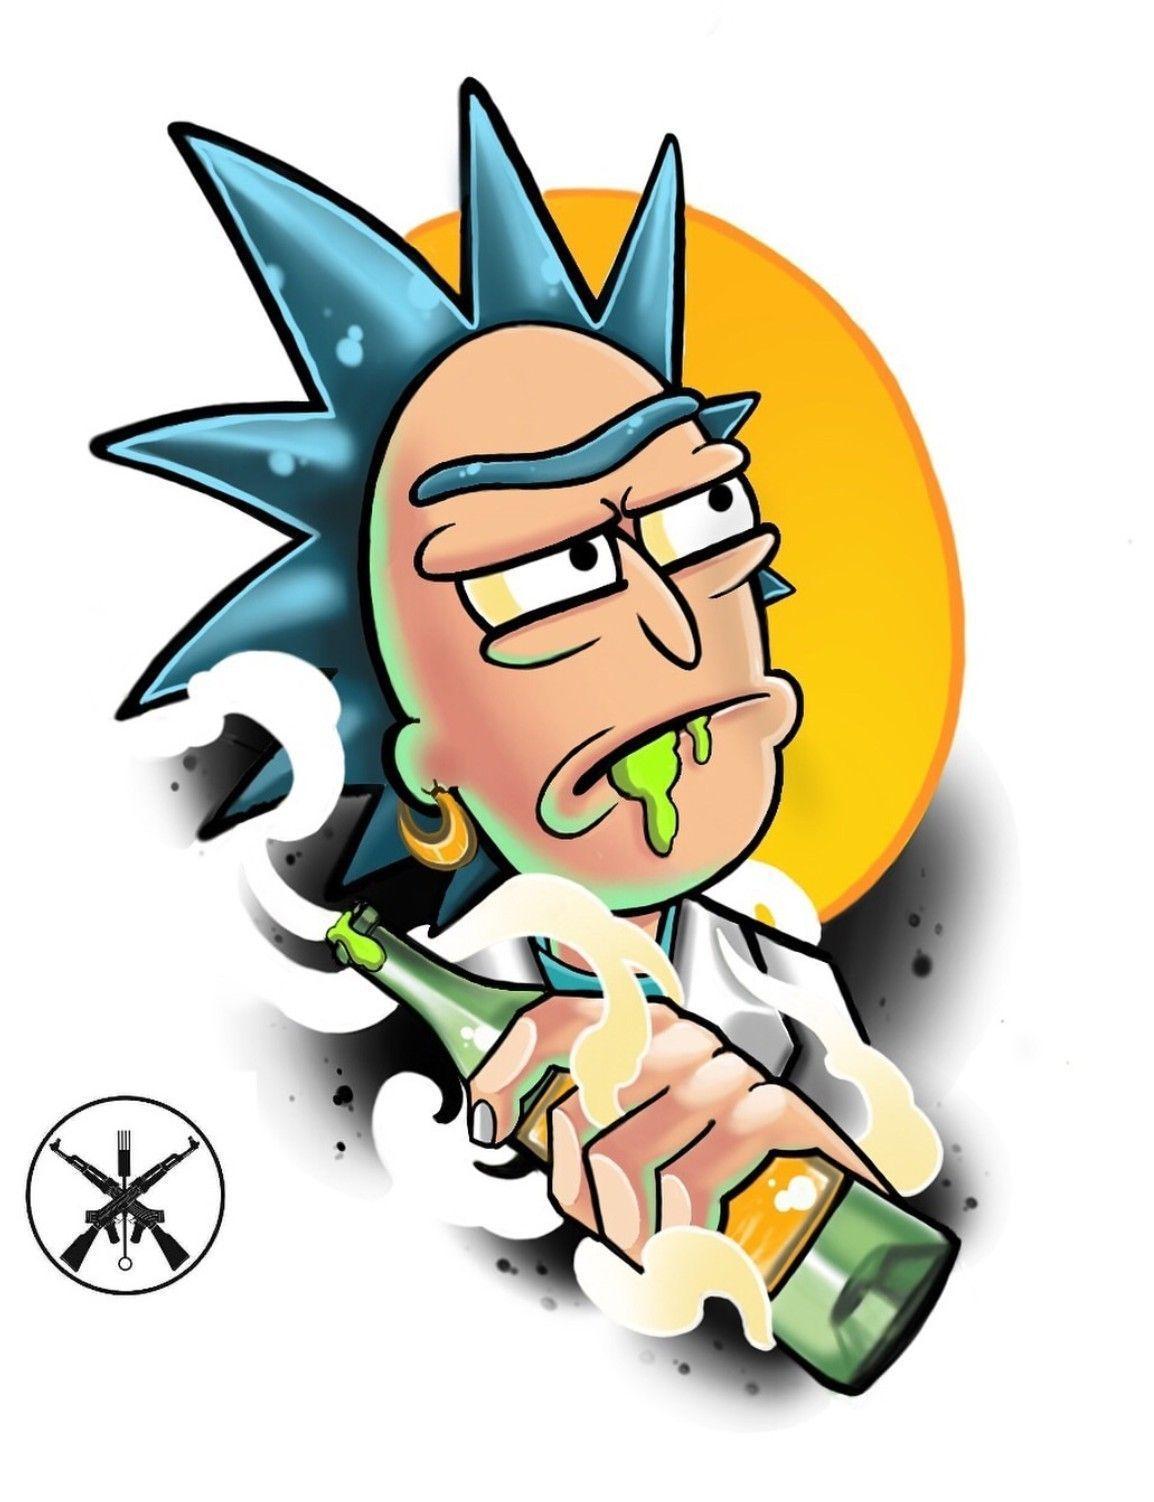 Click To Join Rick And Morty Fandom On Thefandome Com Rick Morty Fando Tatuagem De Rick E Morty Wallpaper De Desenhos Animados Papeis De Parede Psicodelicos